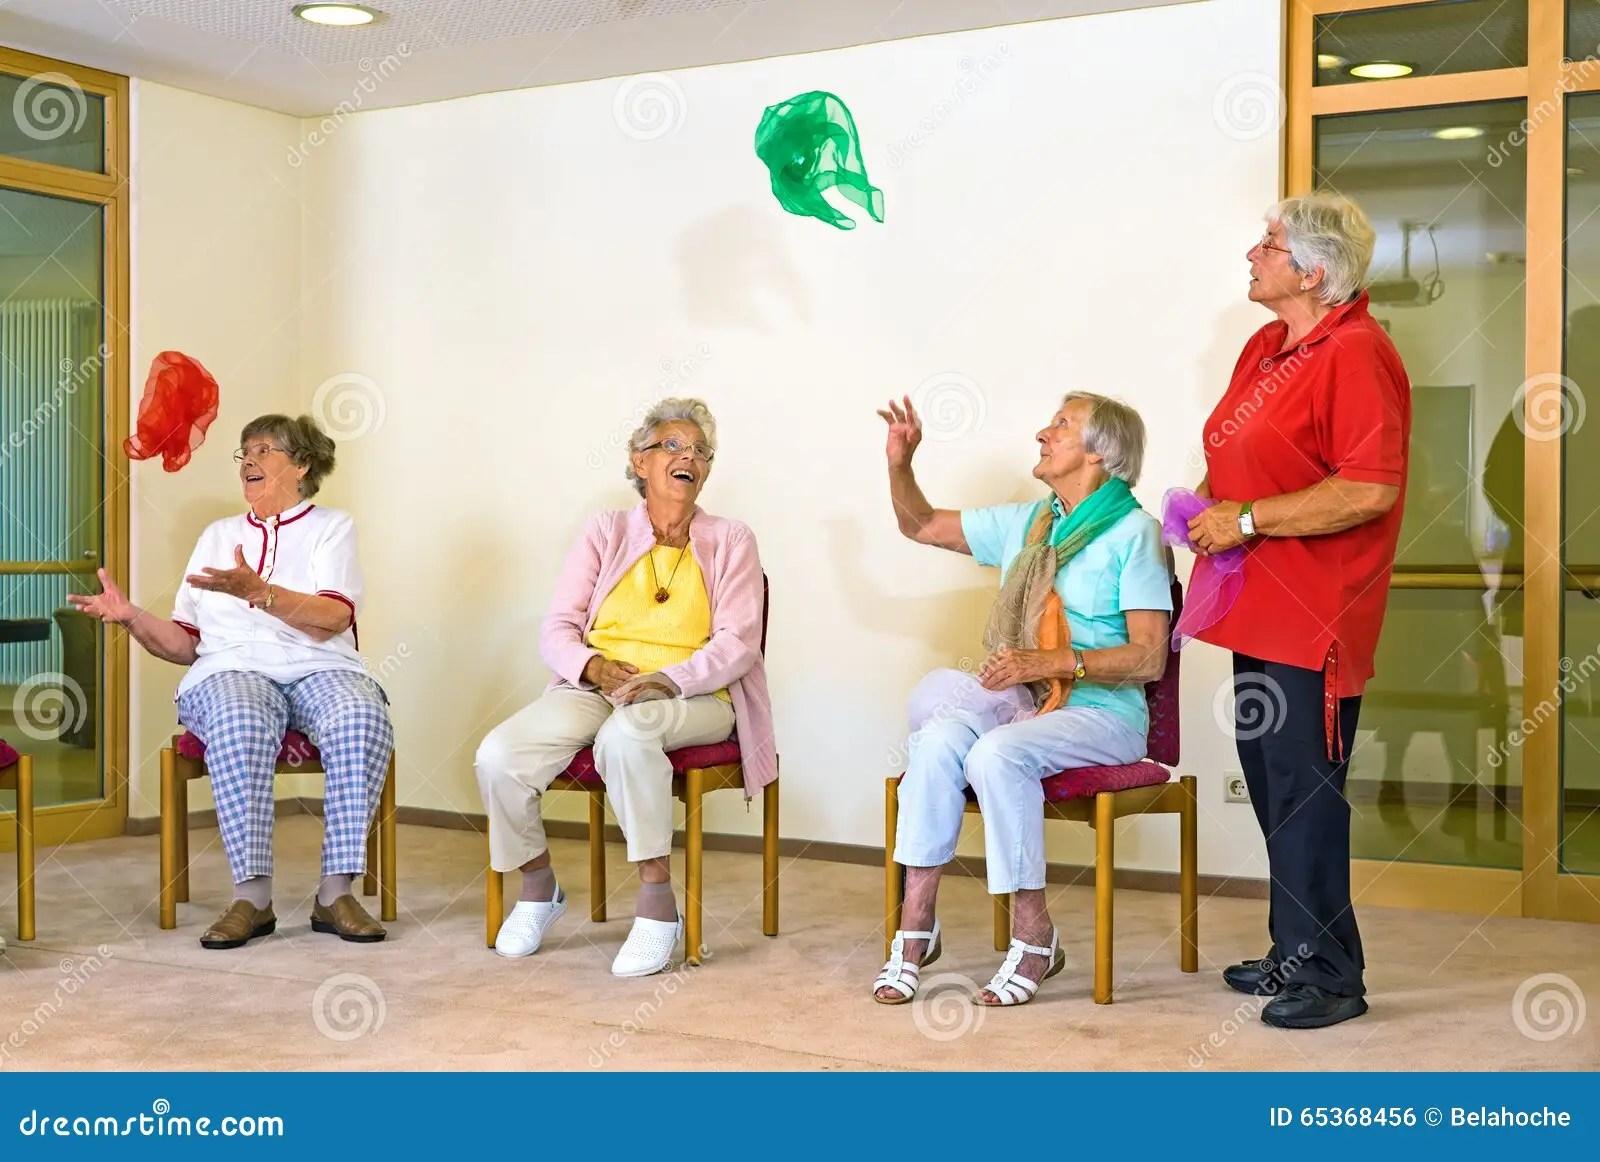 Happy Elderly La S In A Gym Stock Photo